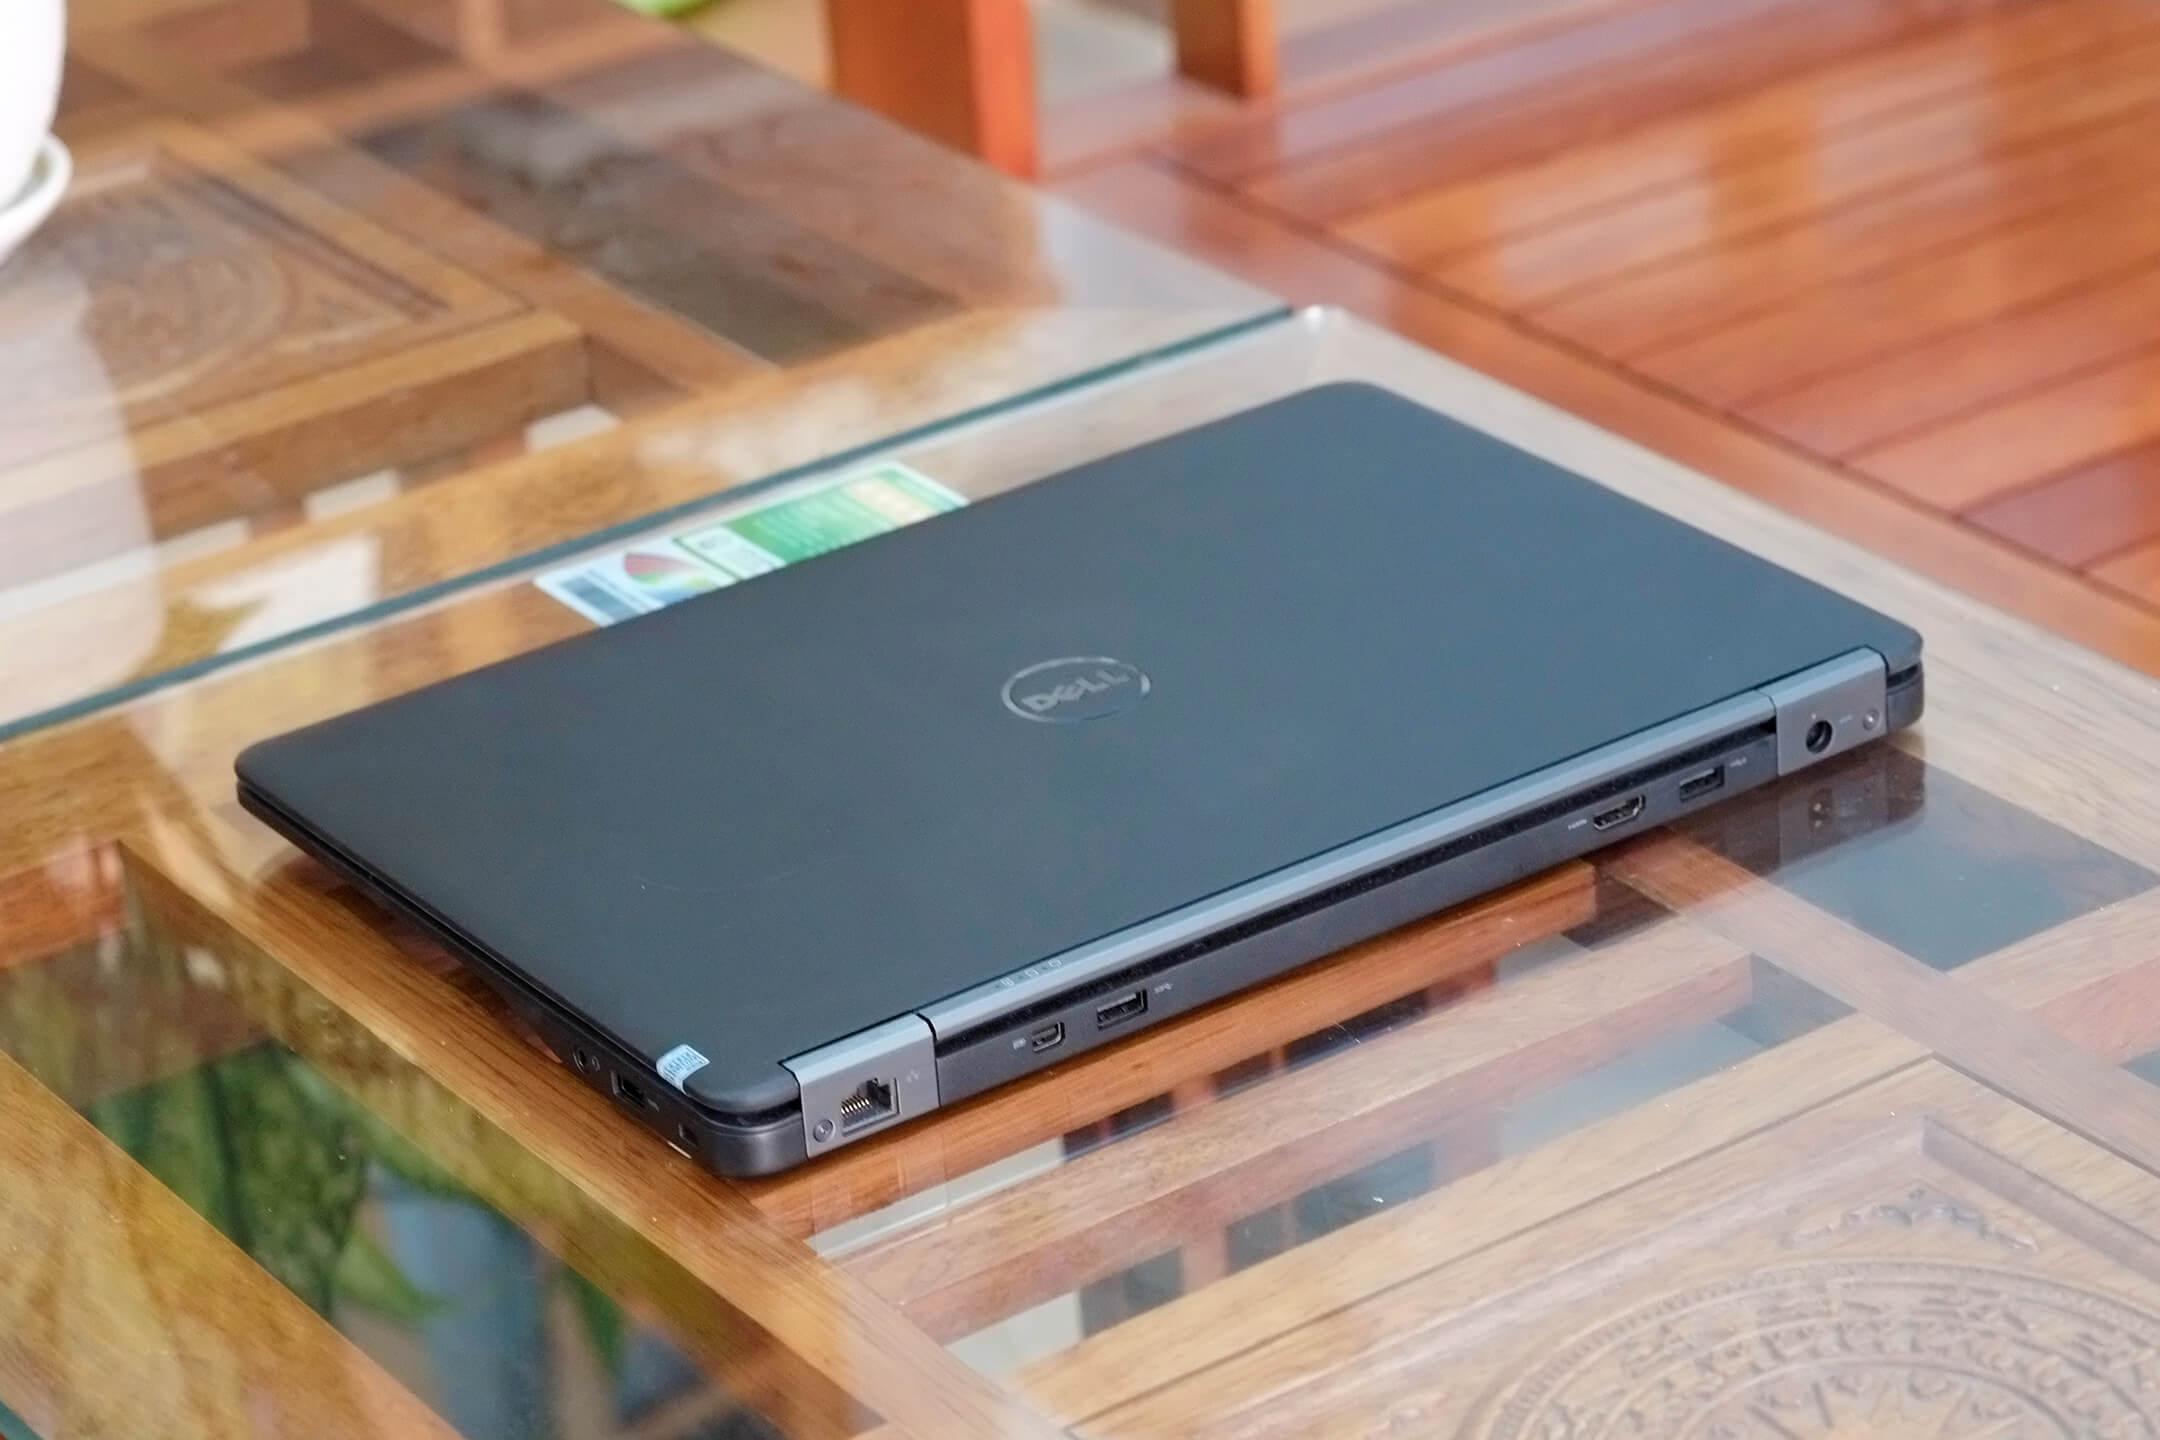 Dell Latitude 7450 i7 5600u / 8GB / 256GB / 14-inch FHD / New 98%